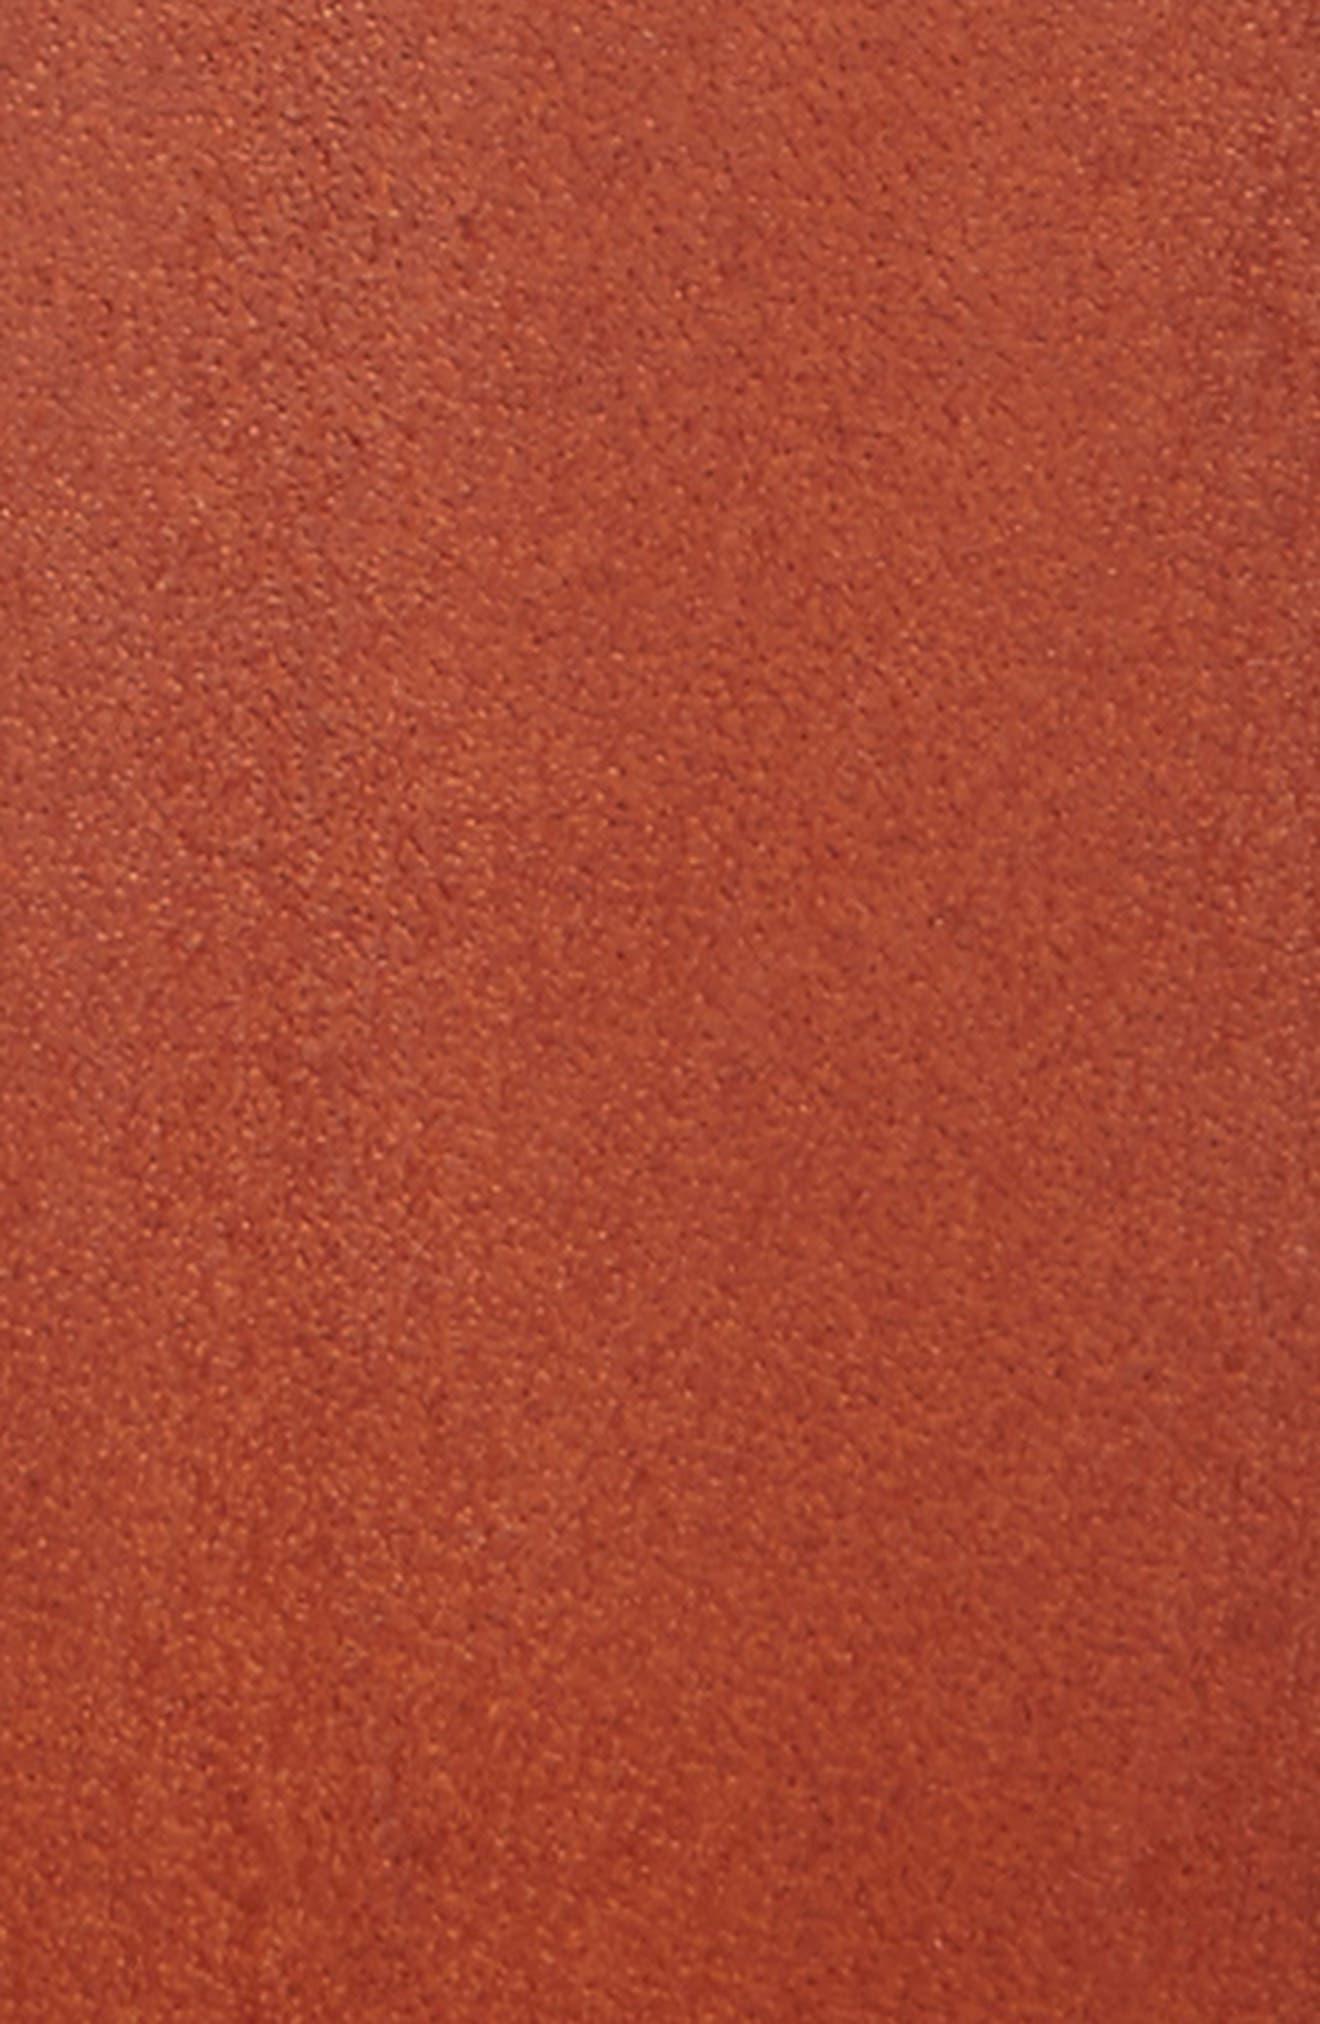 Sammyo Leather Belt,                             Alternate thumbnail 2, color,